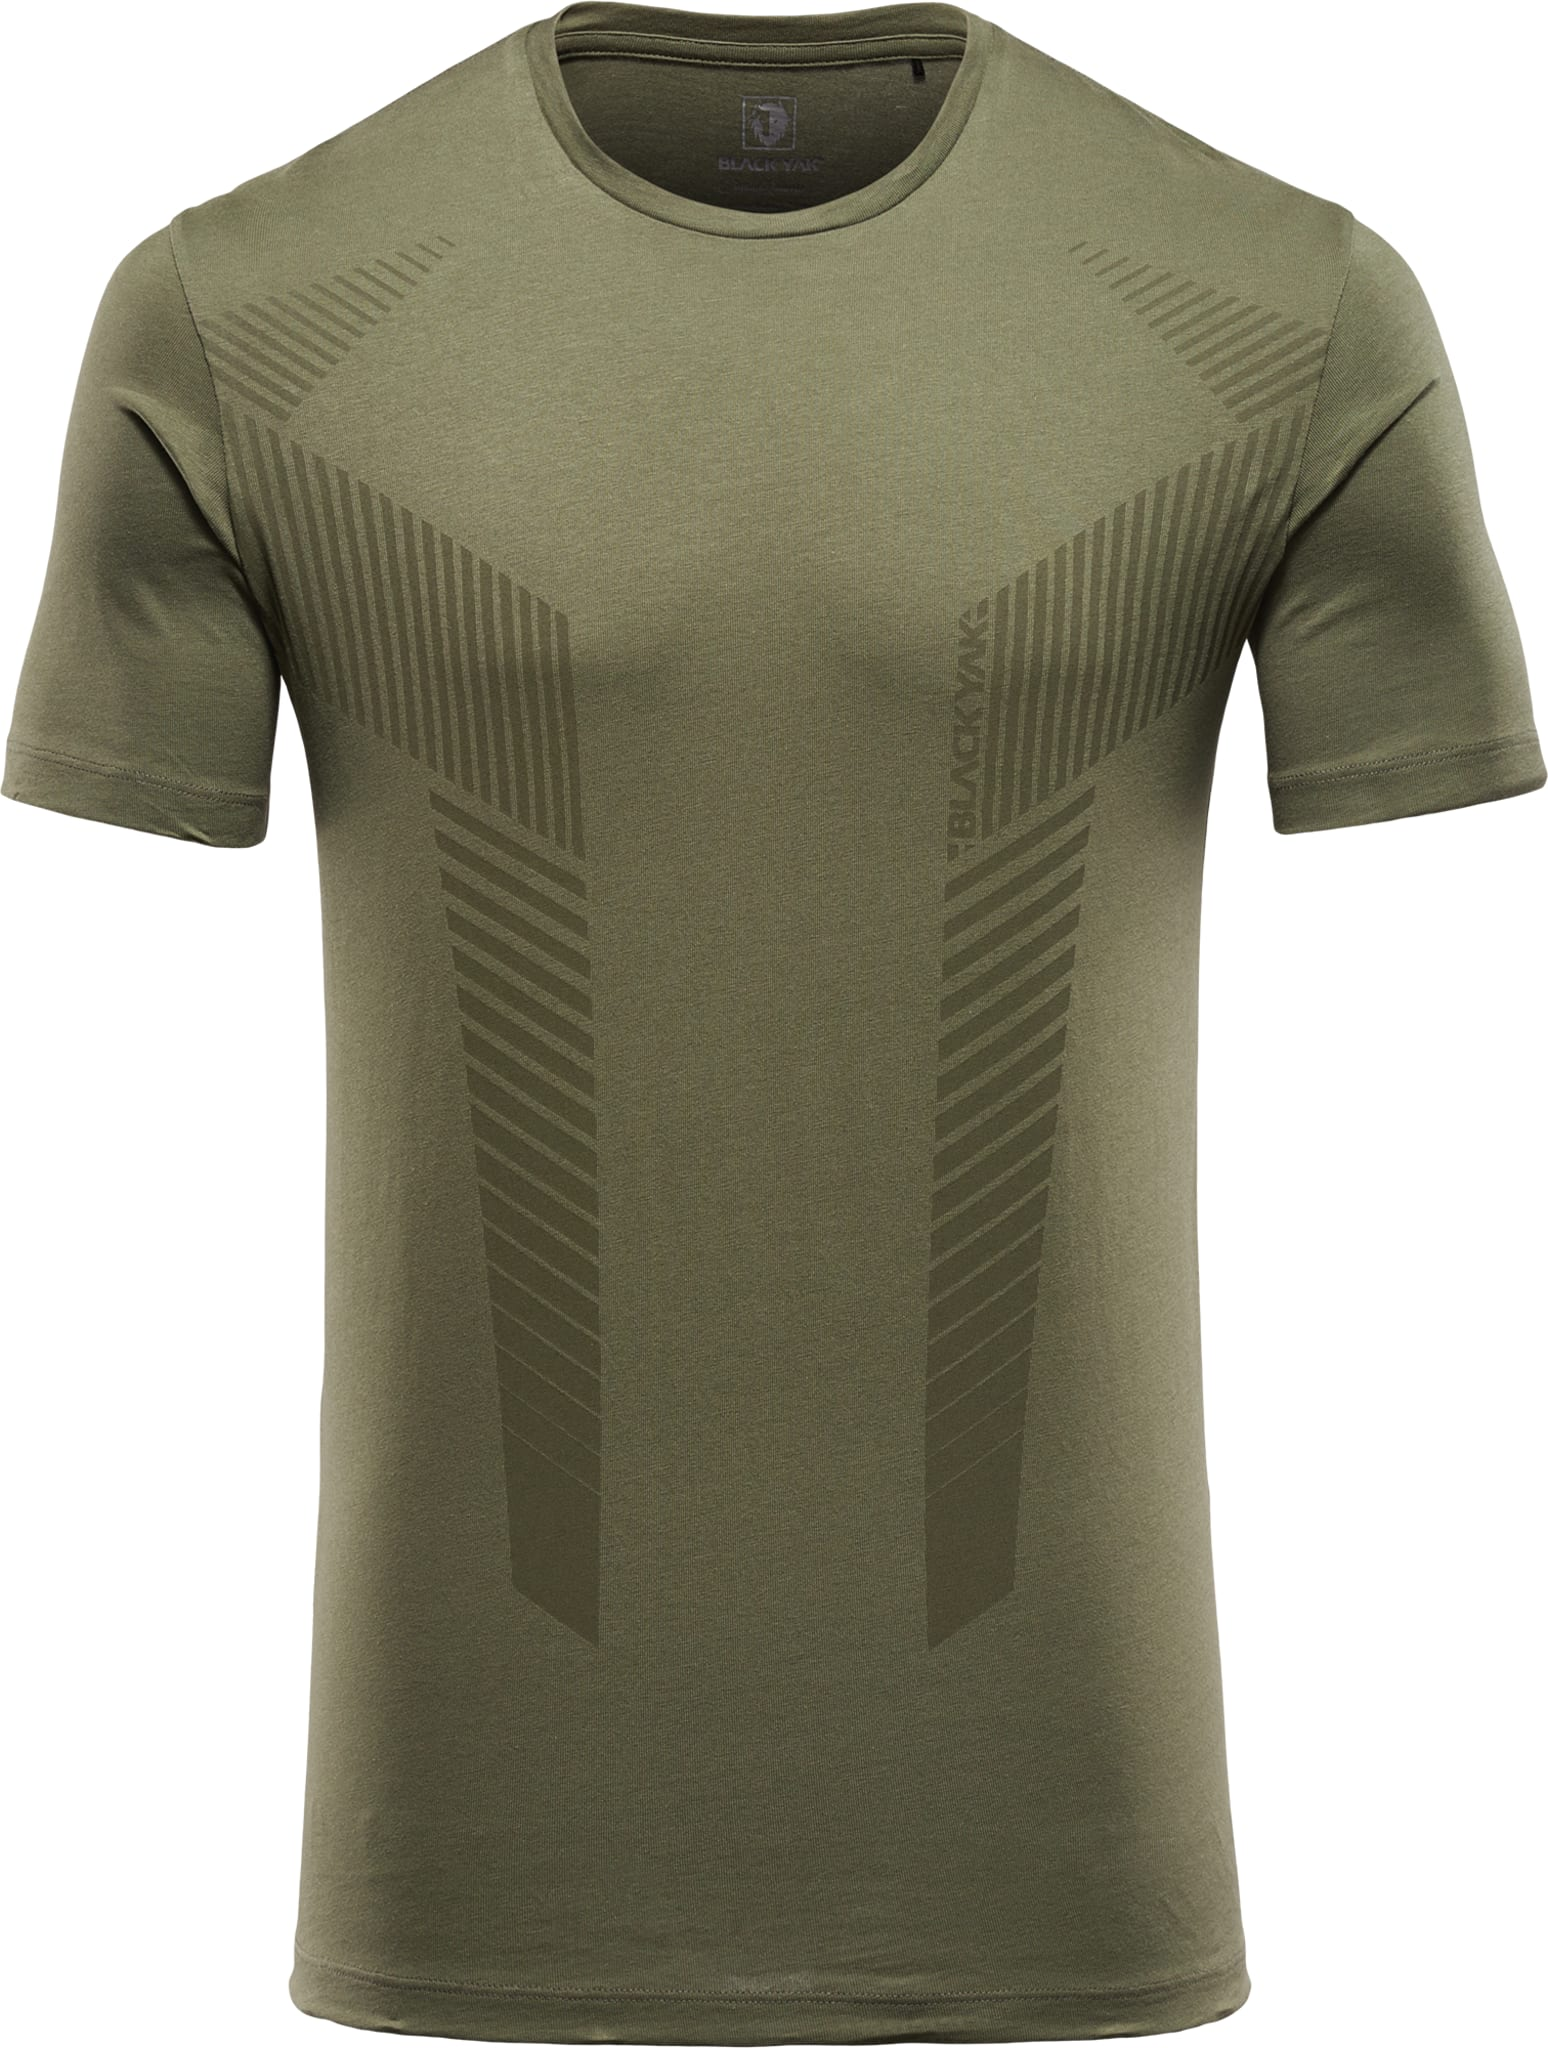 Senepol S/S Shirt Ms